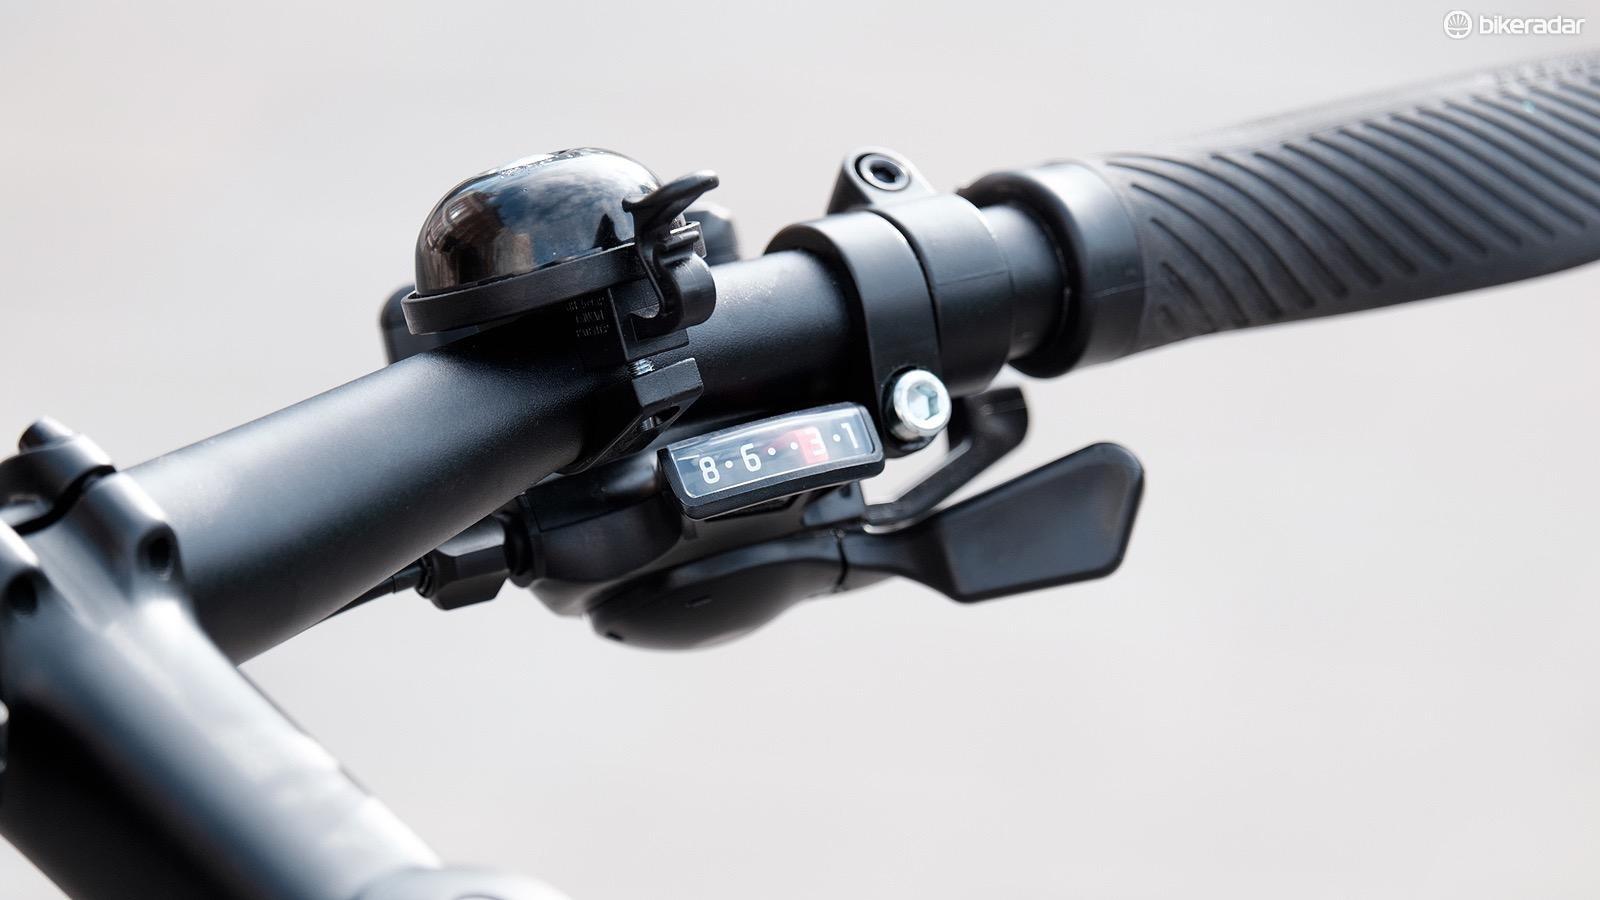 The 3x8 Shimano drivetrain provides plenty of range